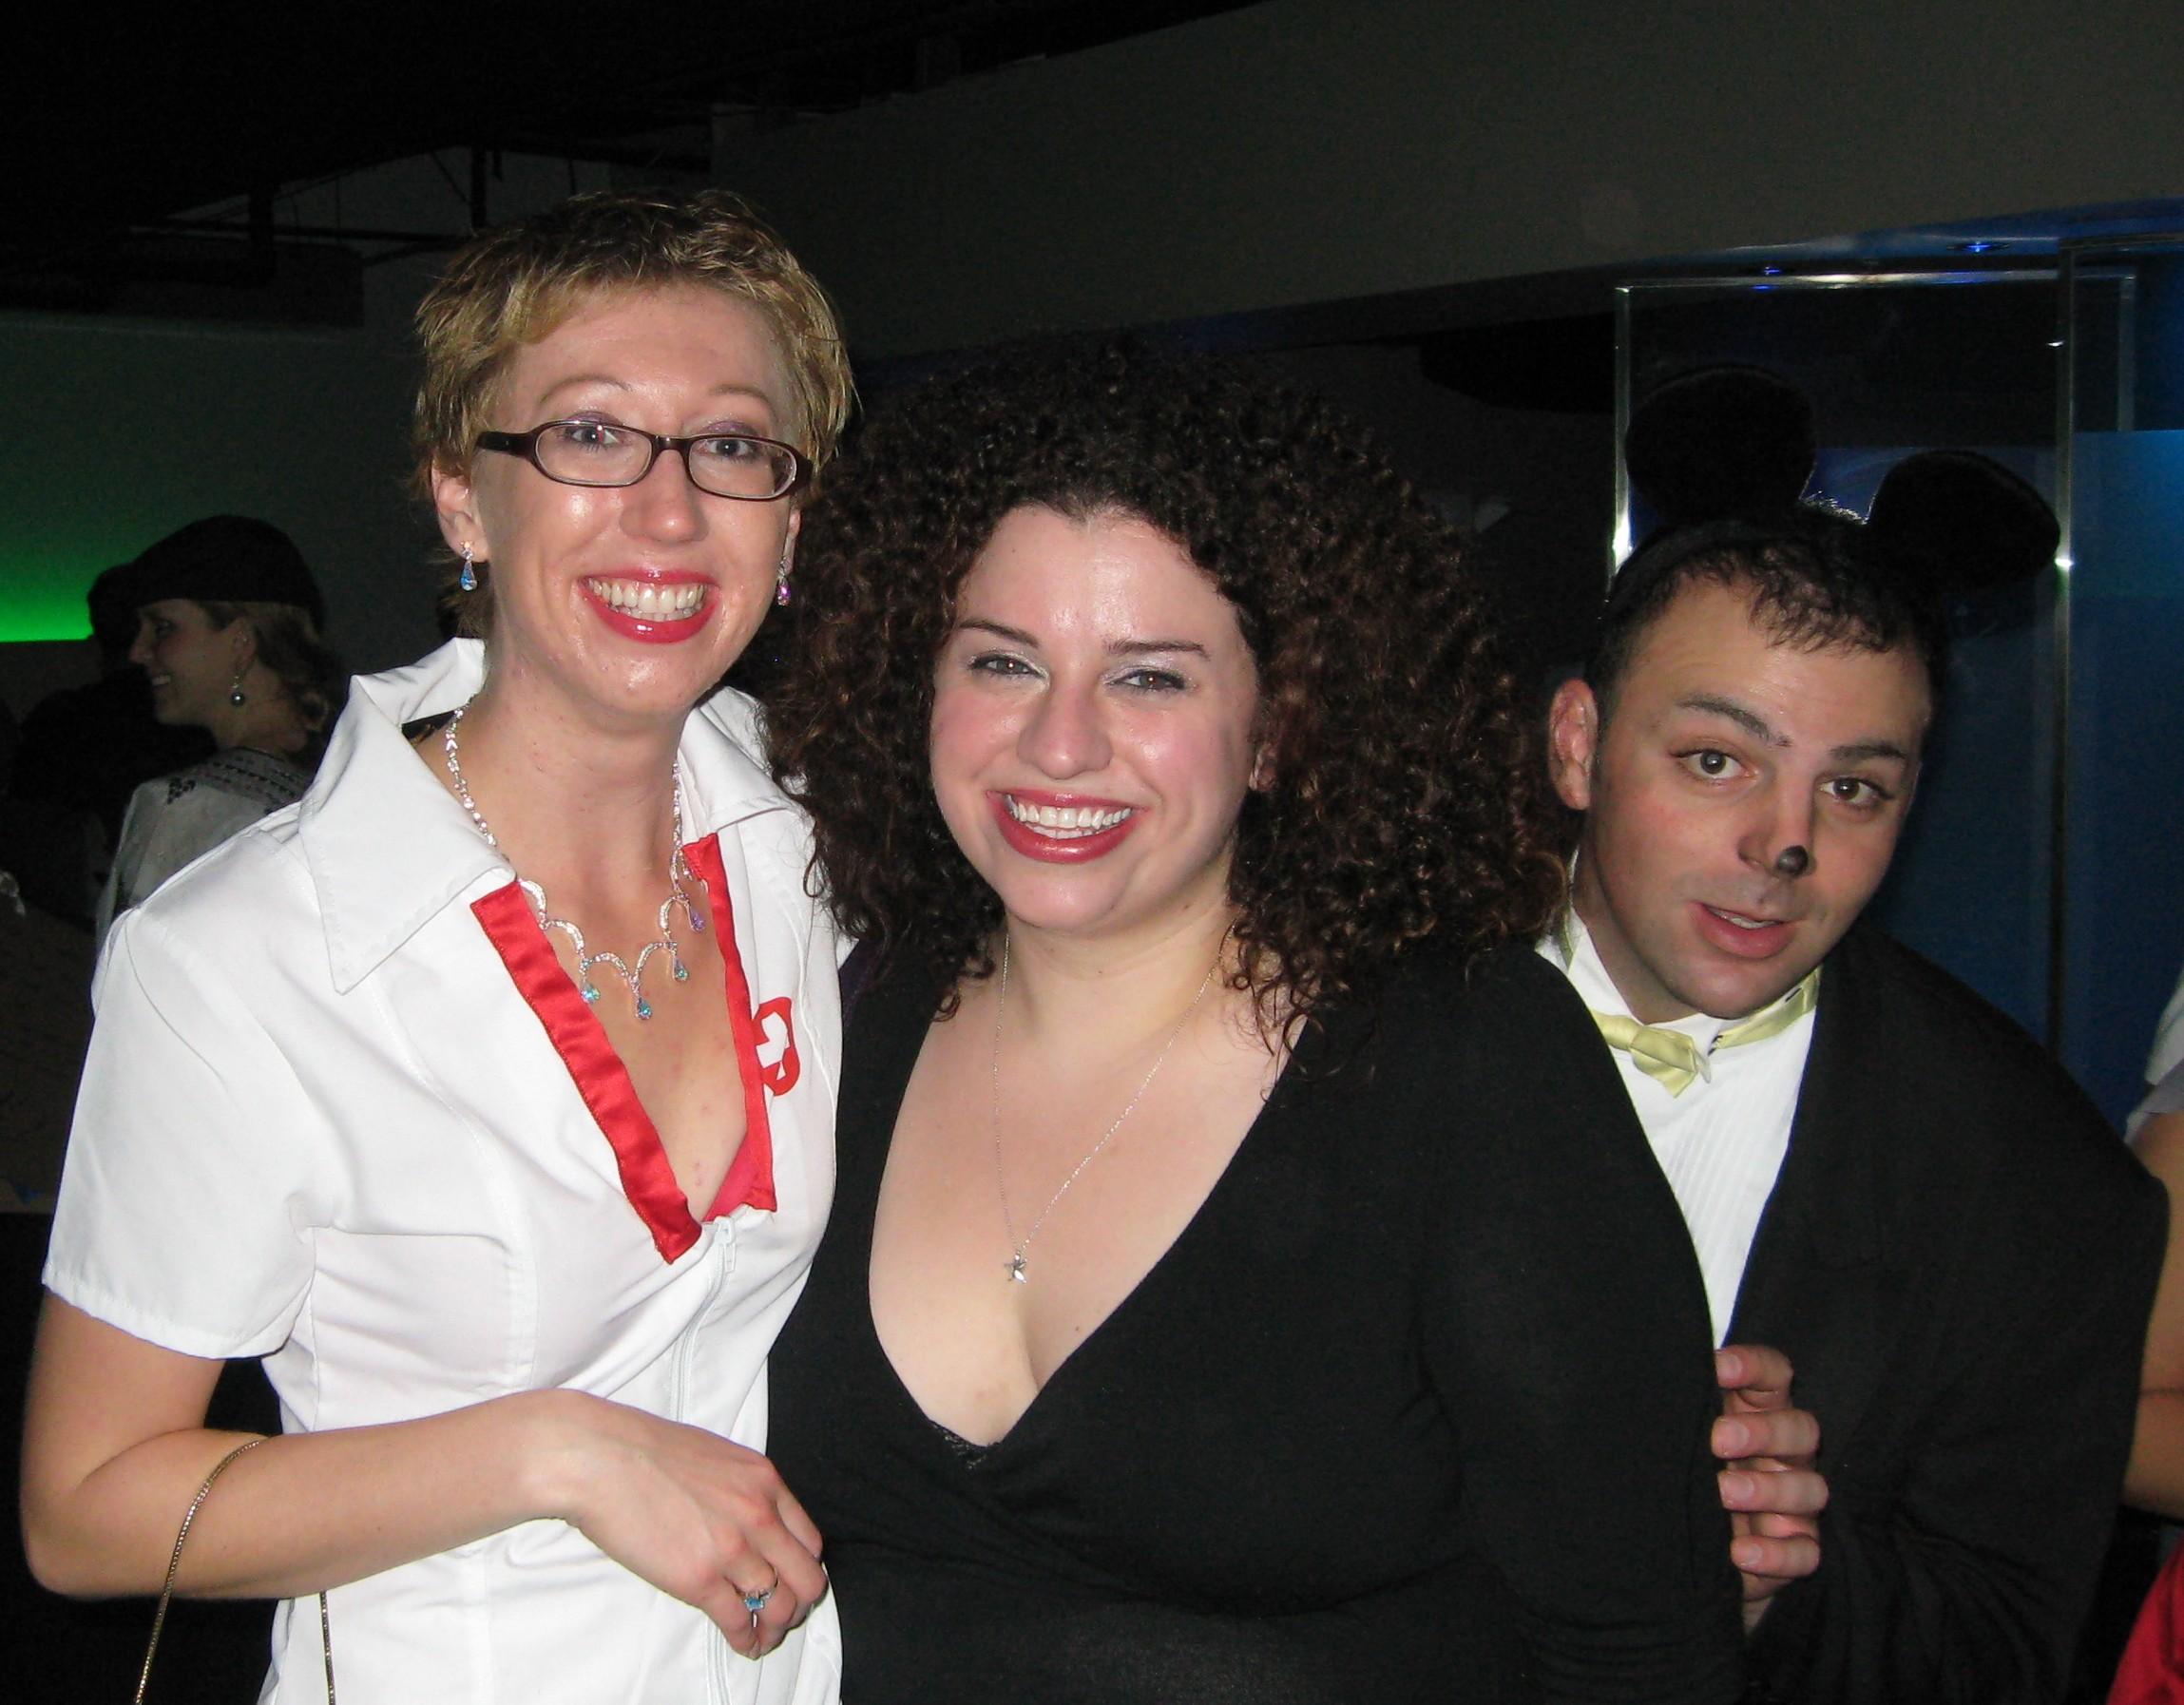 Myself, Maria and Aaron